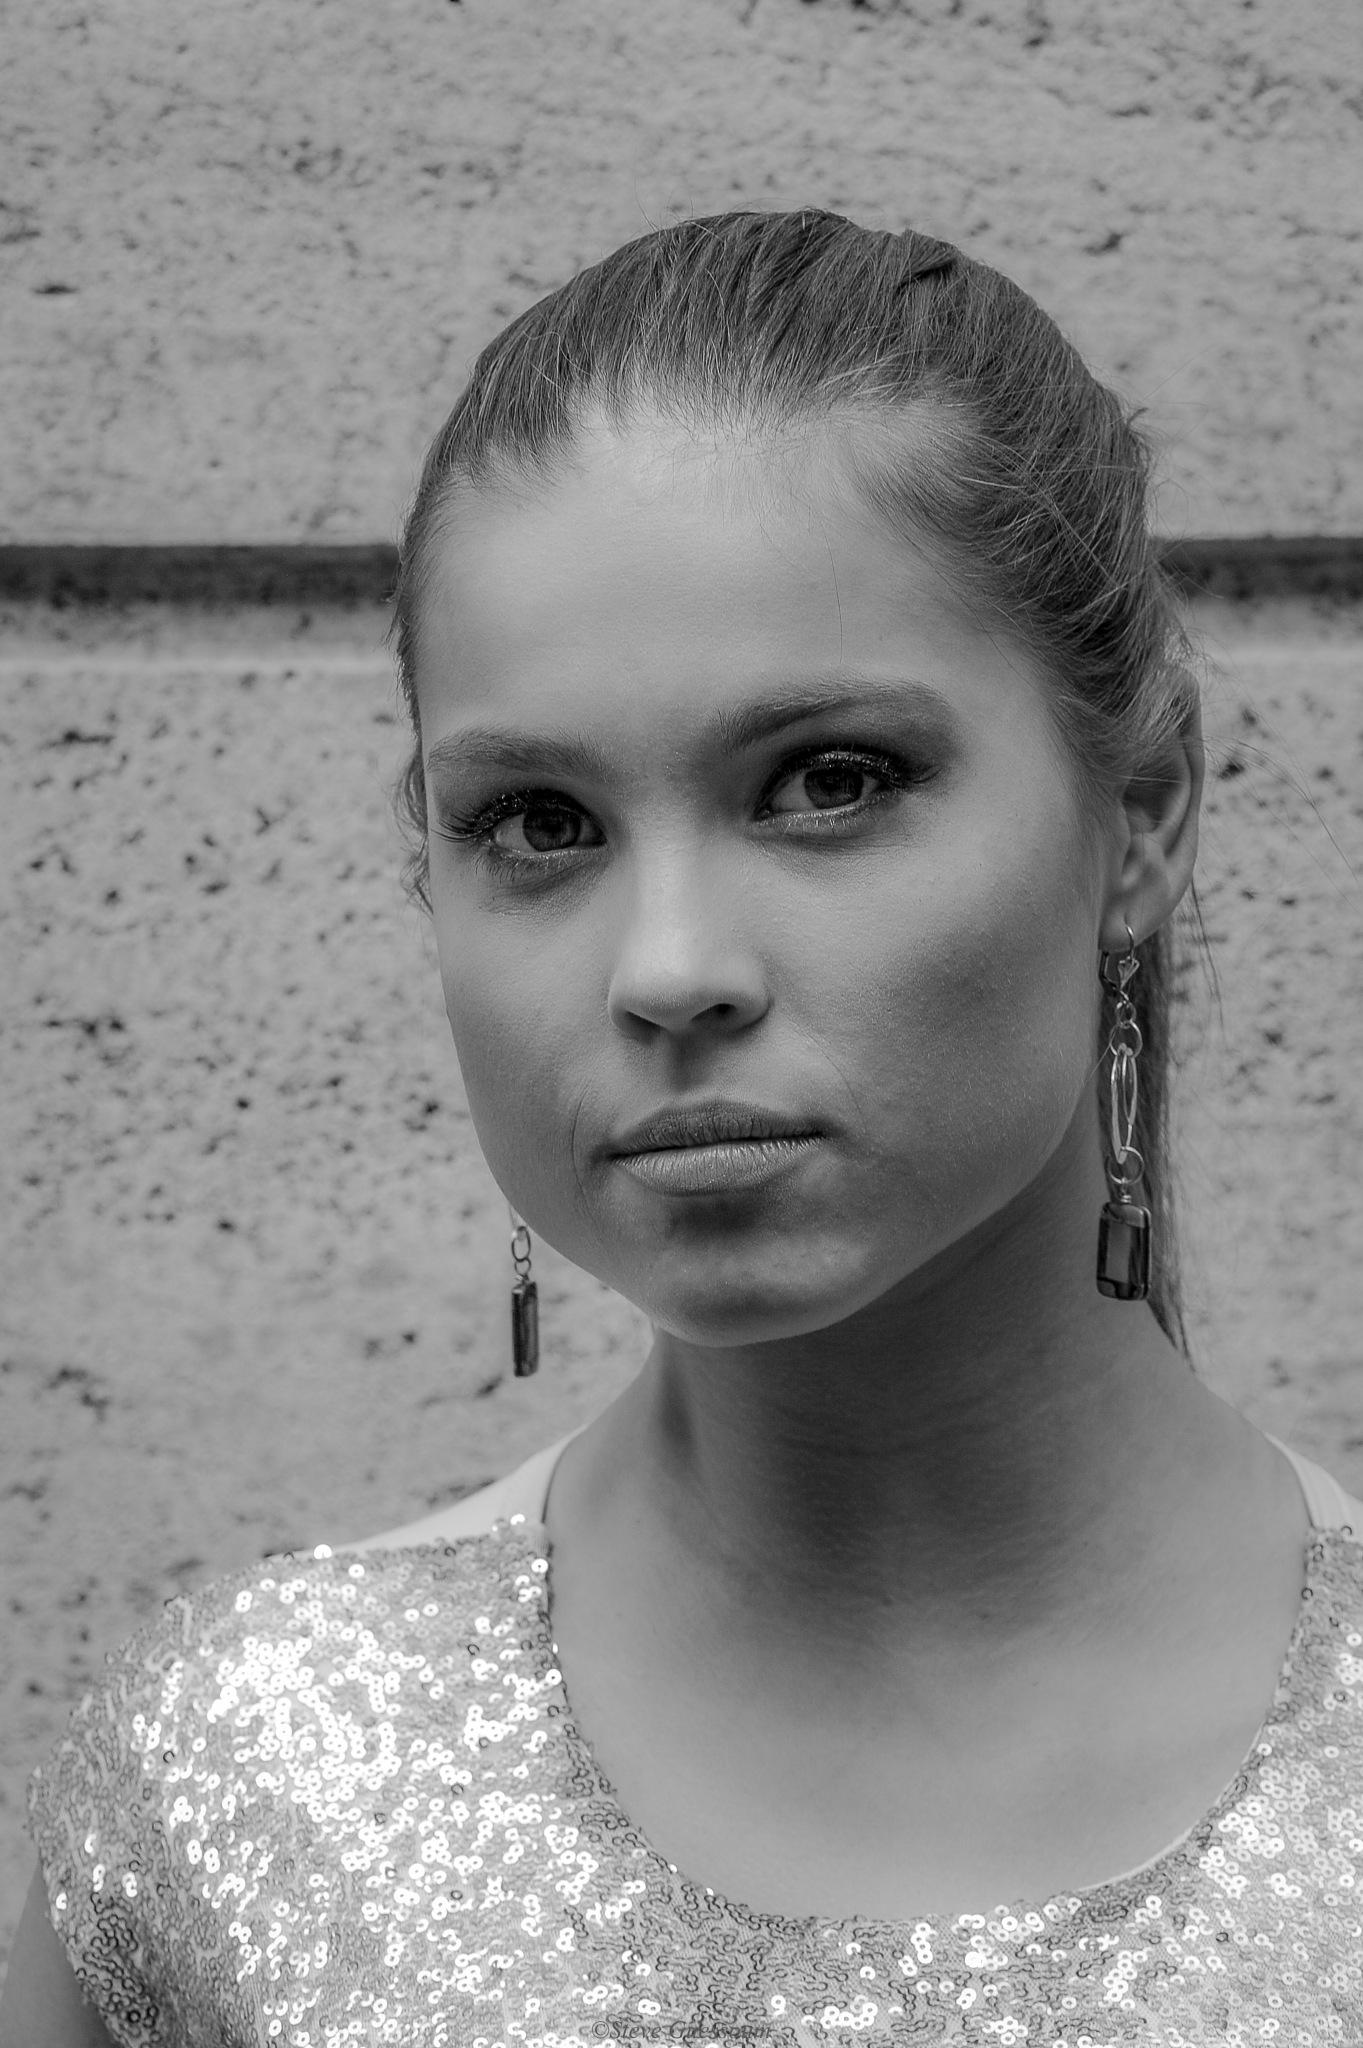 Model: Emily Van Leeuwen  by Steve Guessoum